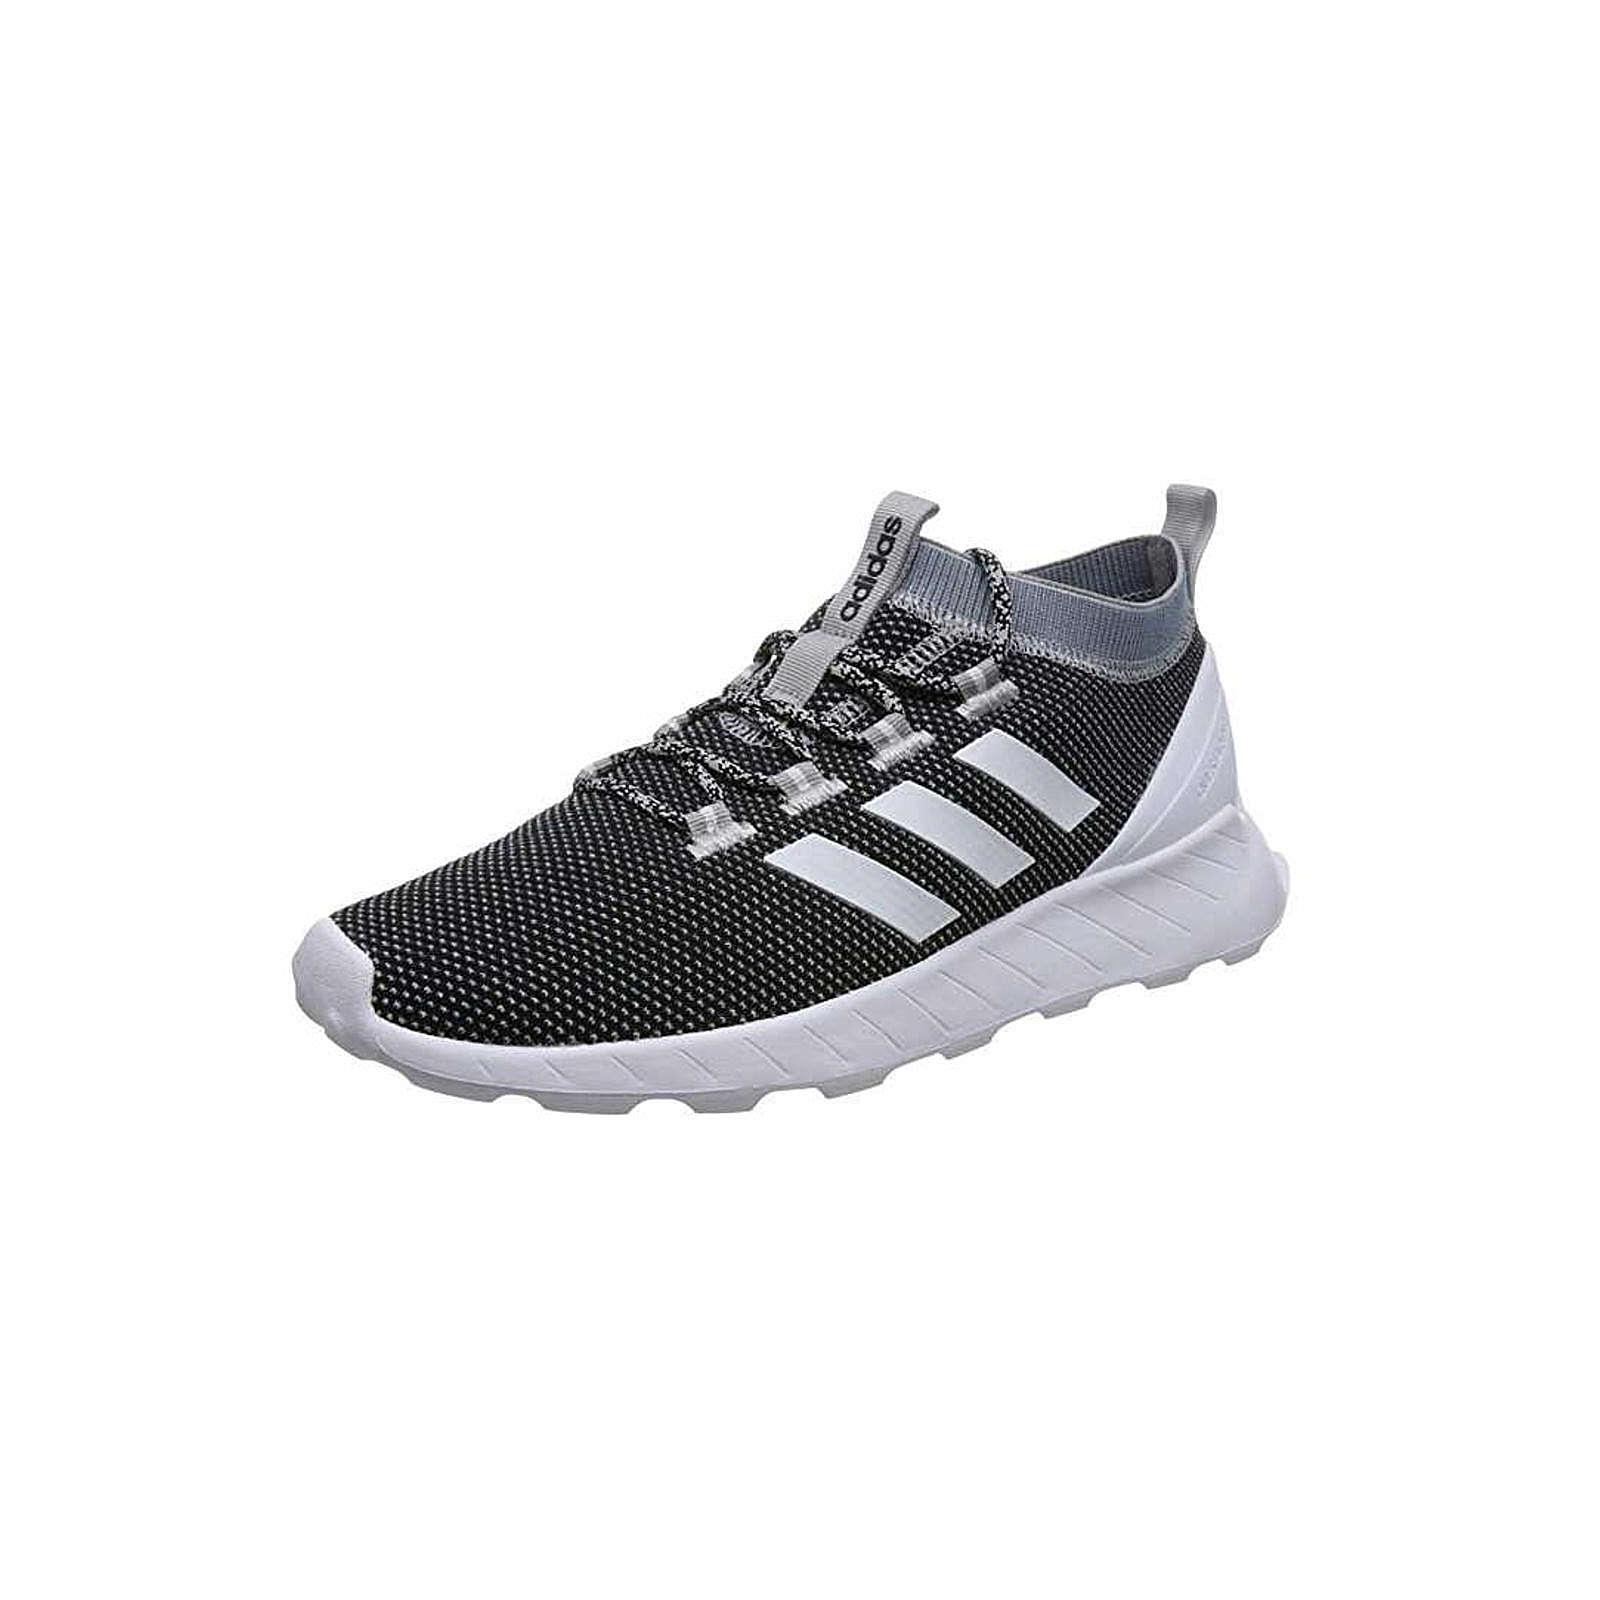 adidas Performance Schnürschuhe schwarz Sneakers Low schwarz Herren Gr. 44